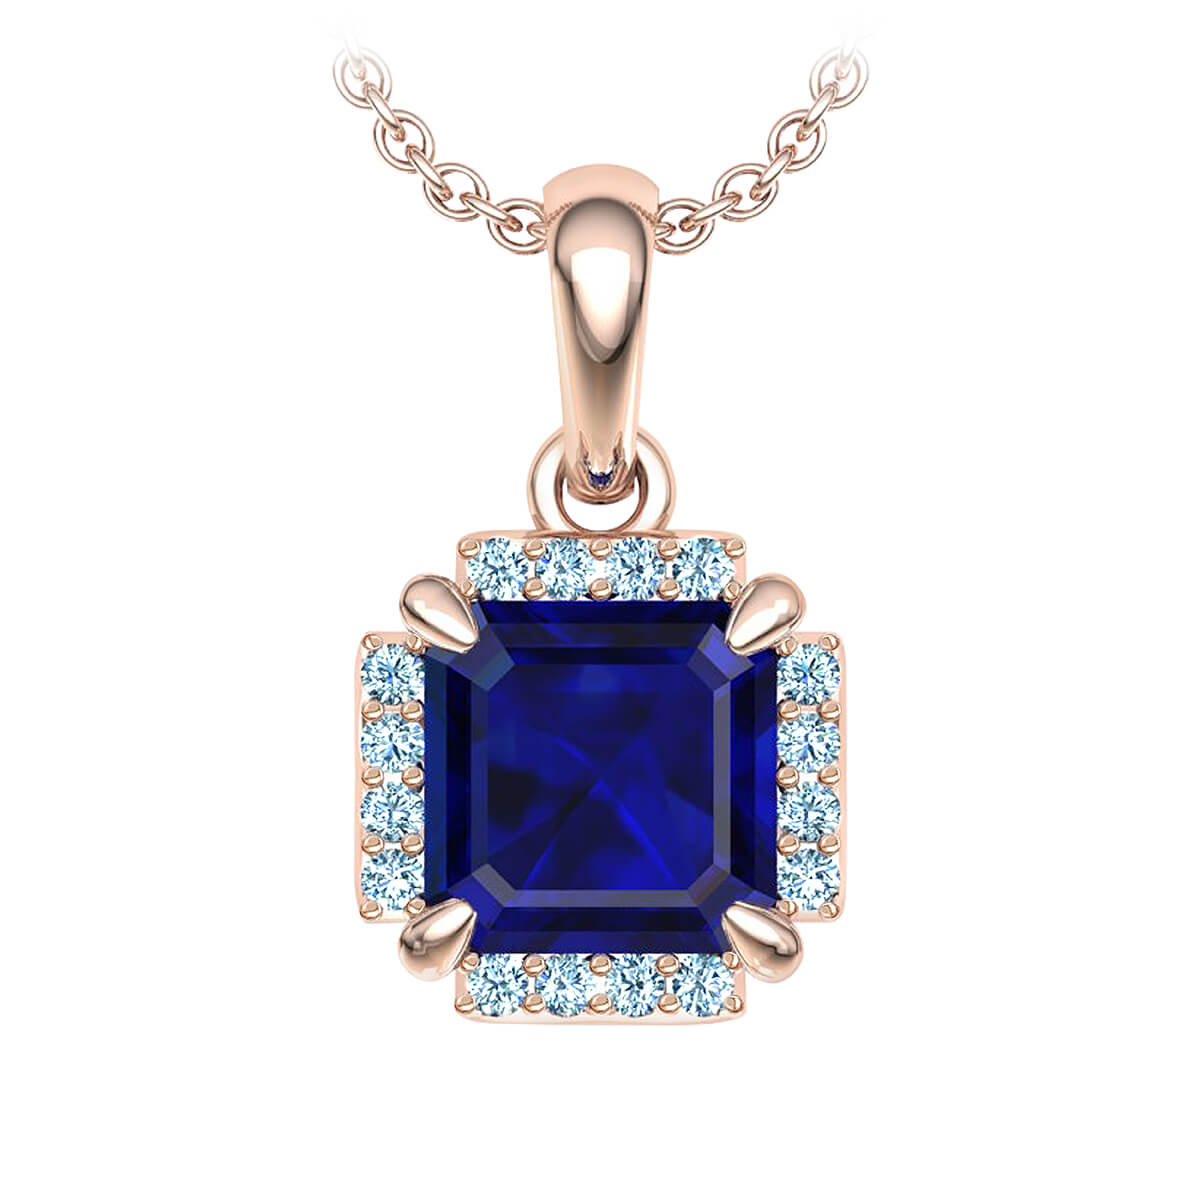 Frances Blue Sapphire and Diamond Necklace